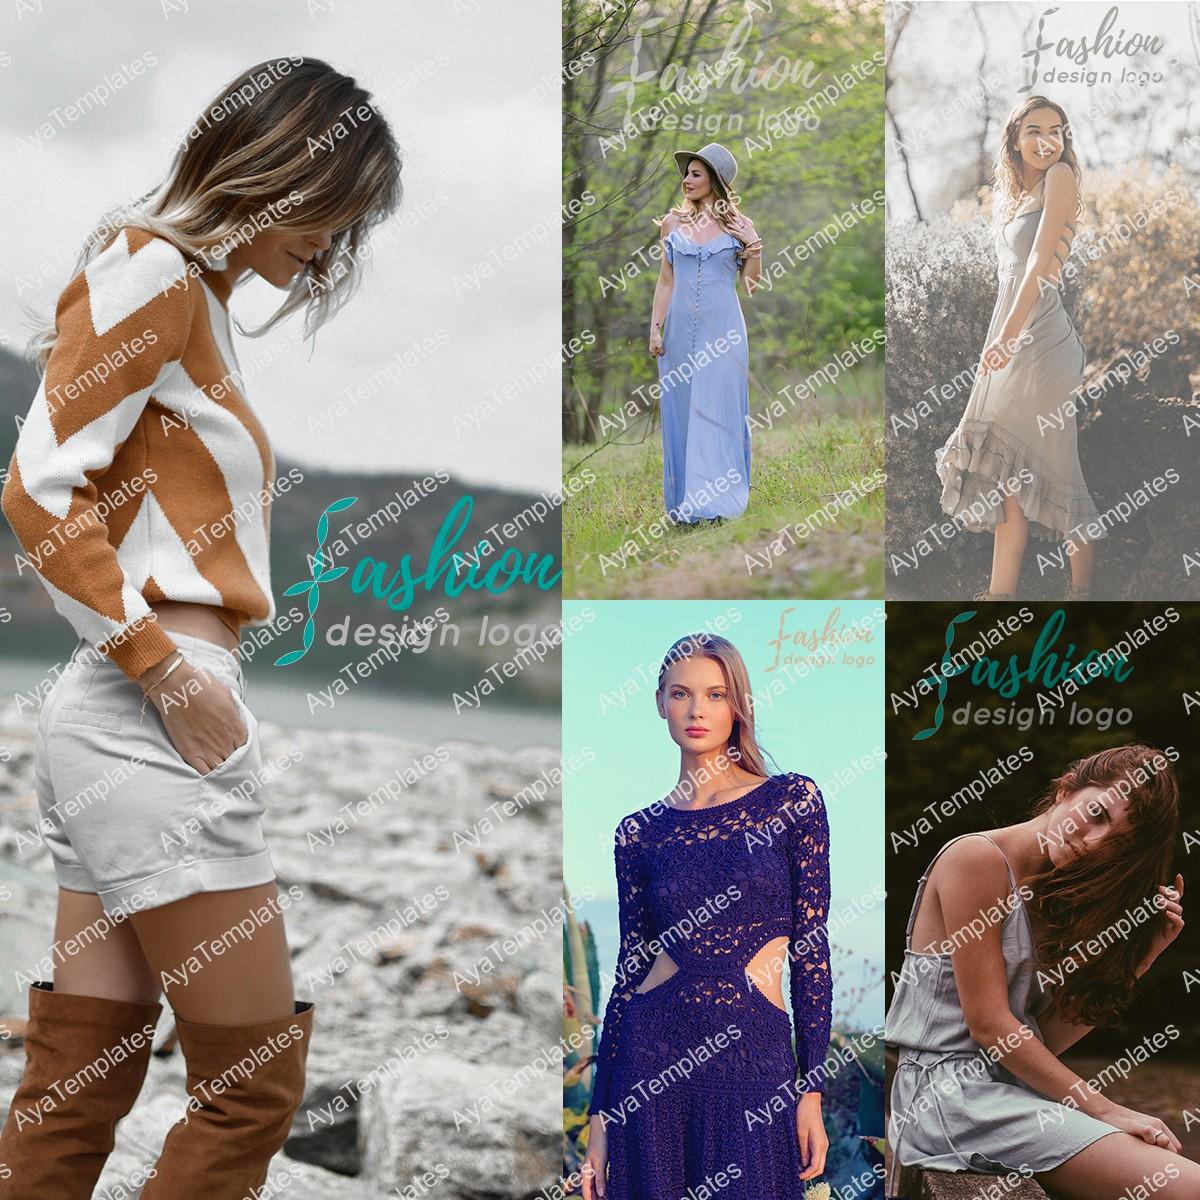 fashion-design-logo-mockup-collage